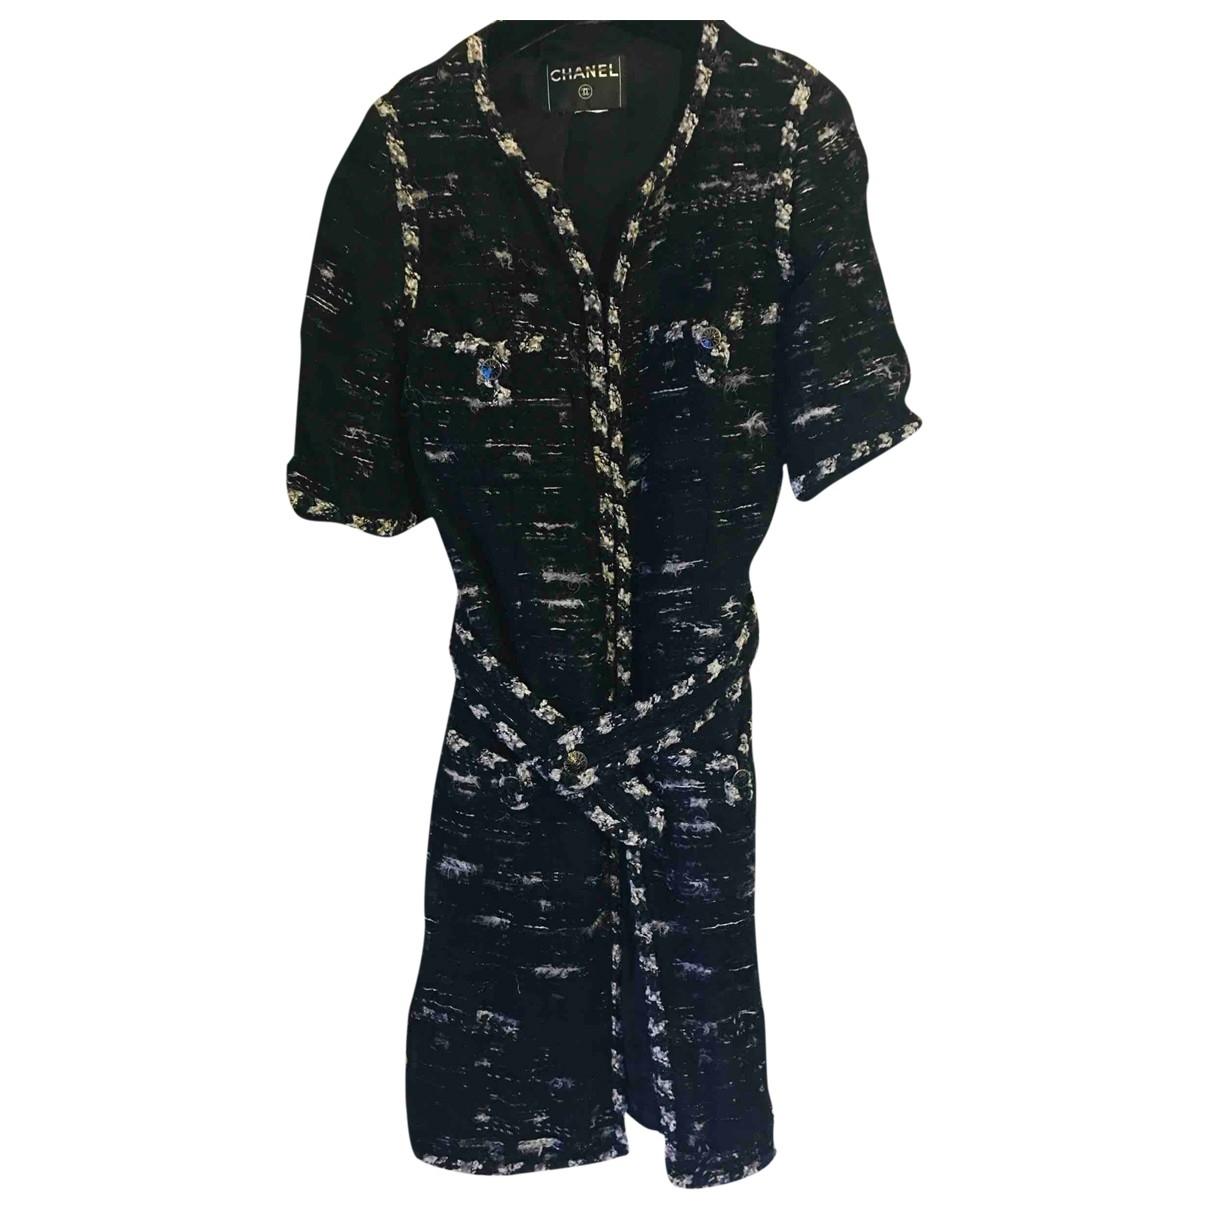 Chanel \N Black Tweed jacket for Women 34 FR